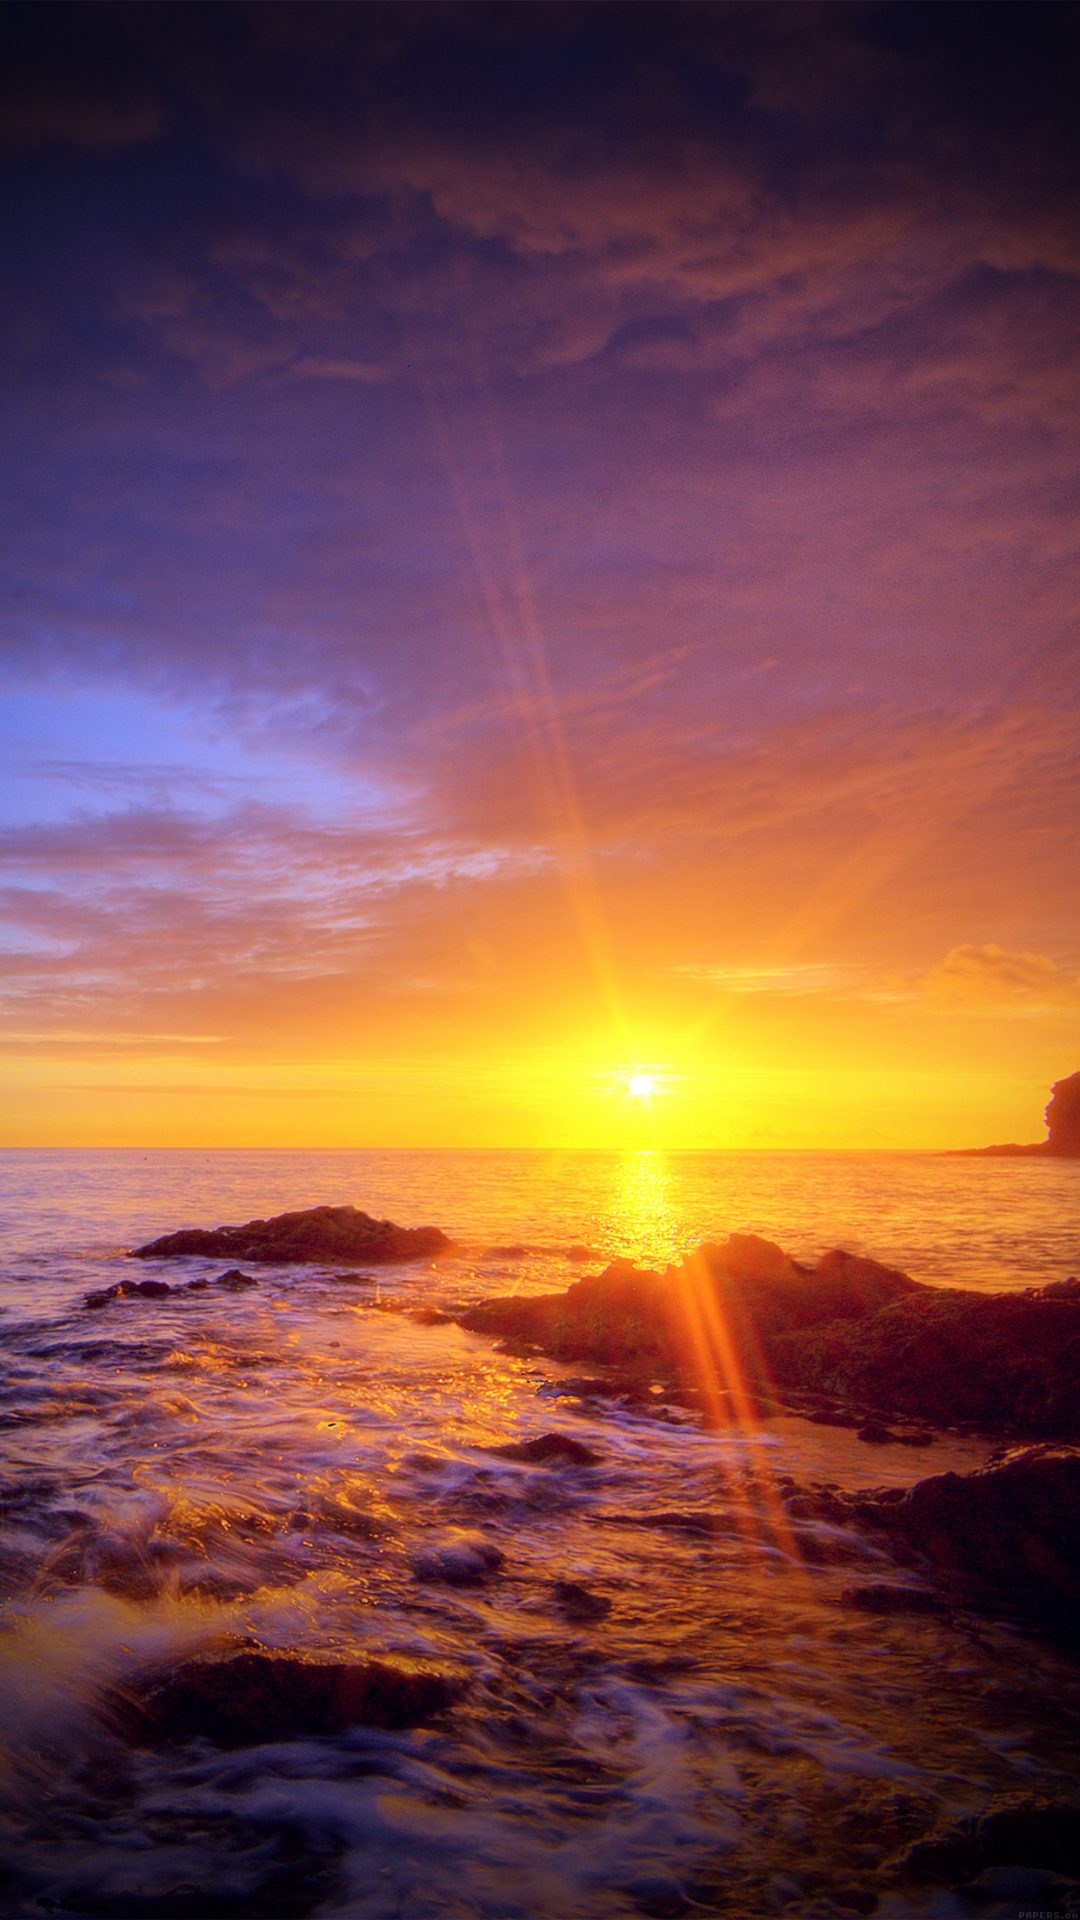 Sunshine Evening Sunset Beach Rock Nature Vignette